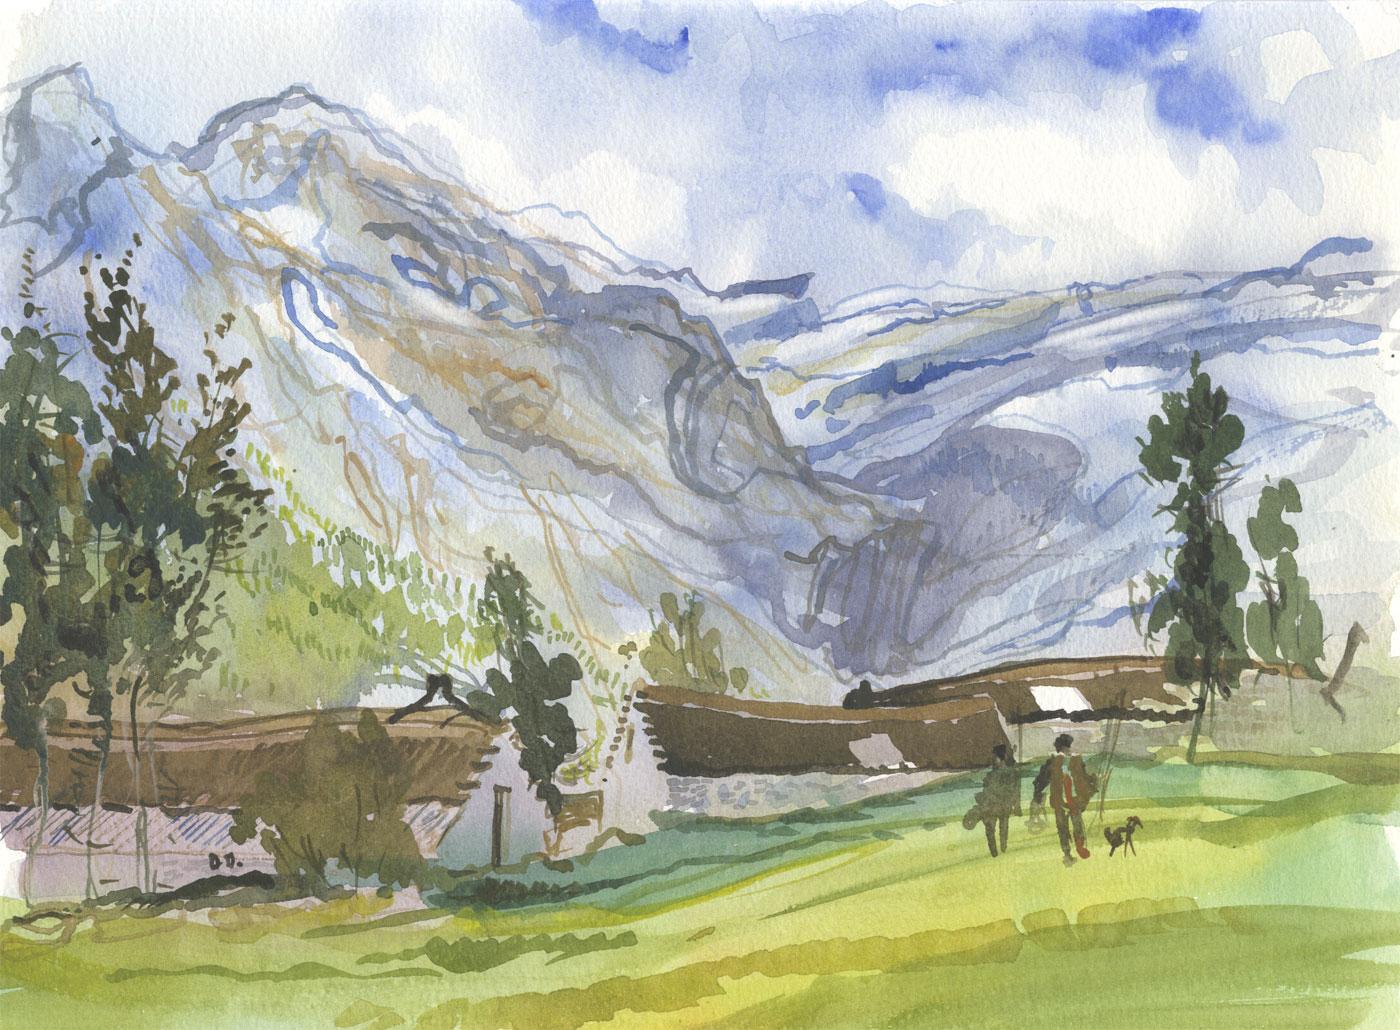 Robert T. Blayney (1929-2016) - Mid 20th Century Watercolour, Hiking